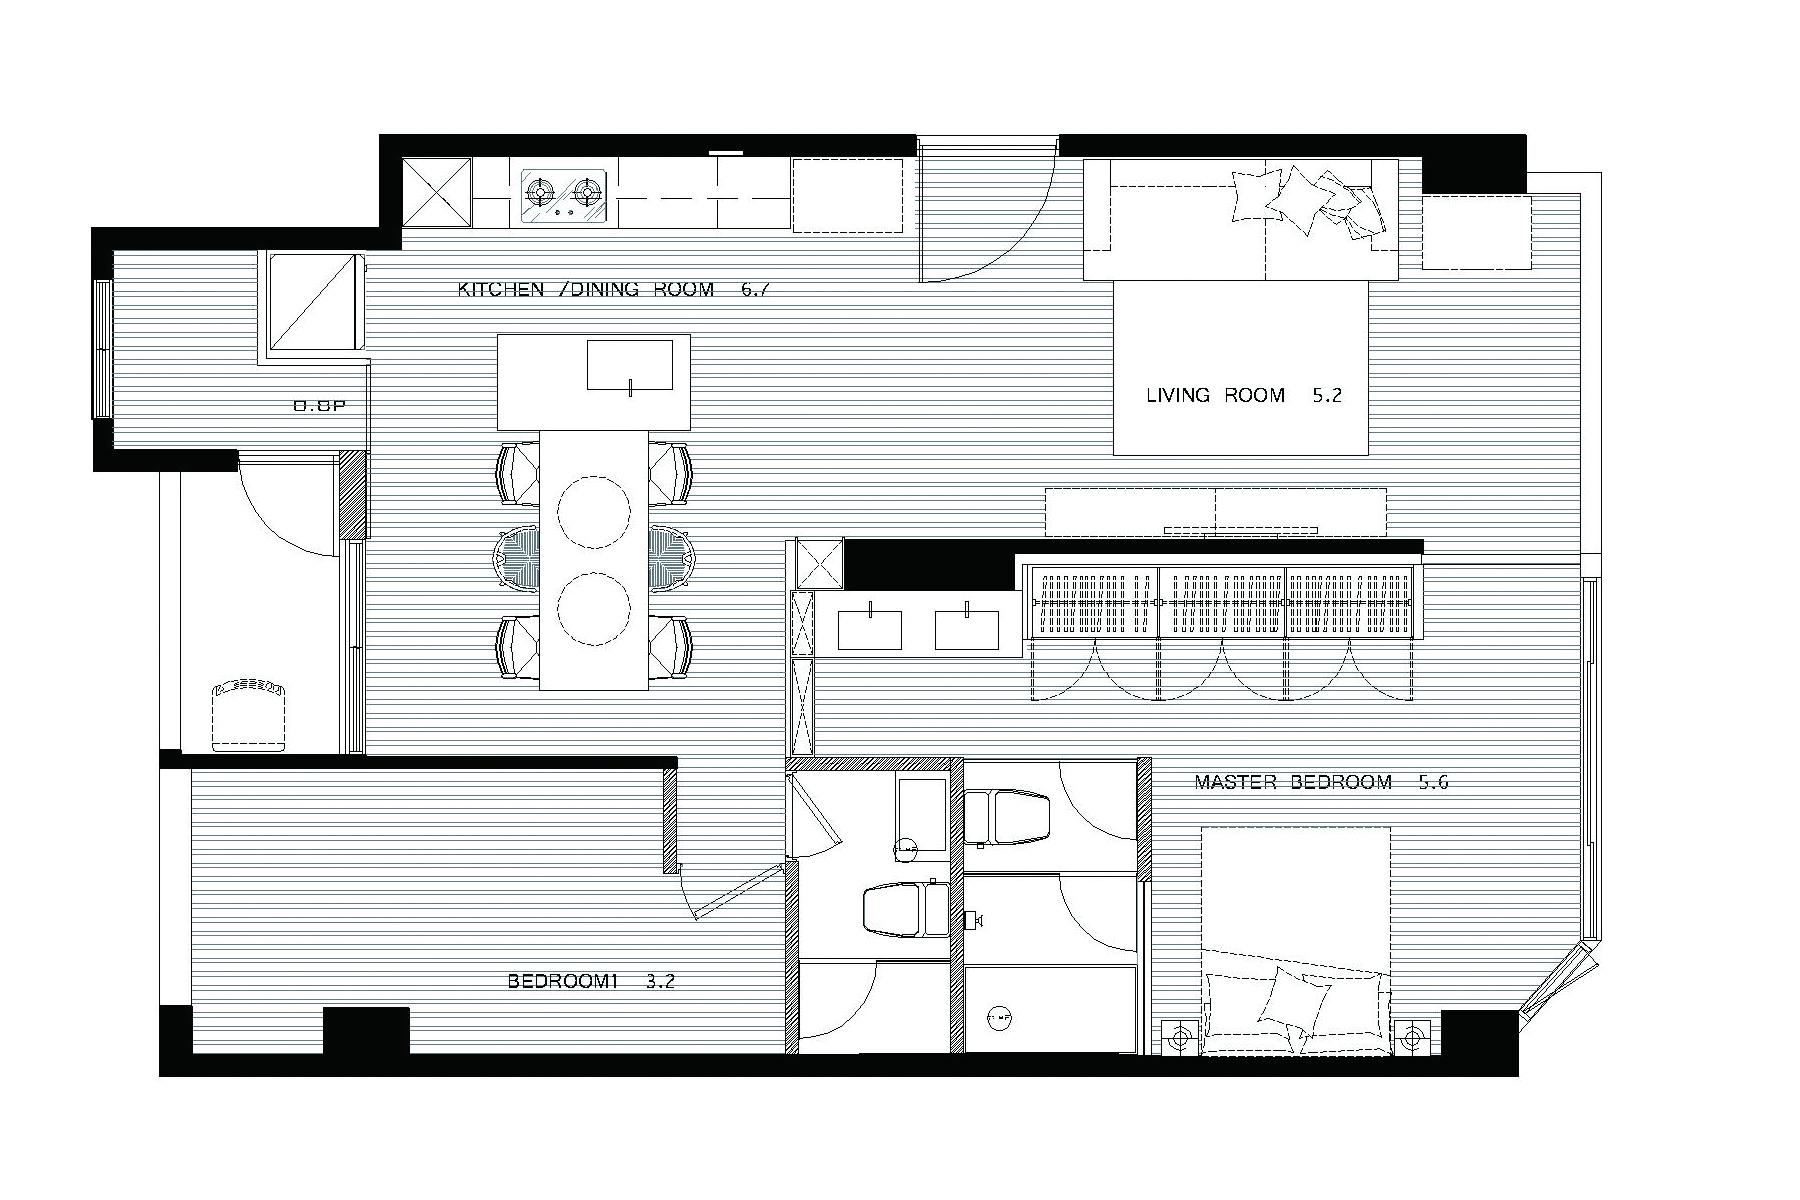 18 apartment floorplan | Interior Design Ideas. on my house foundation, grandma's house floor plan, my house interior, my house layout, my house view, bb house floor plan, my house map, a house floor plan, my house front door,